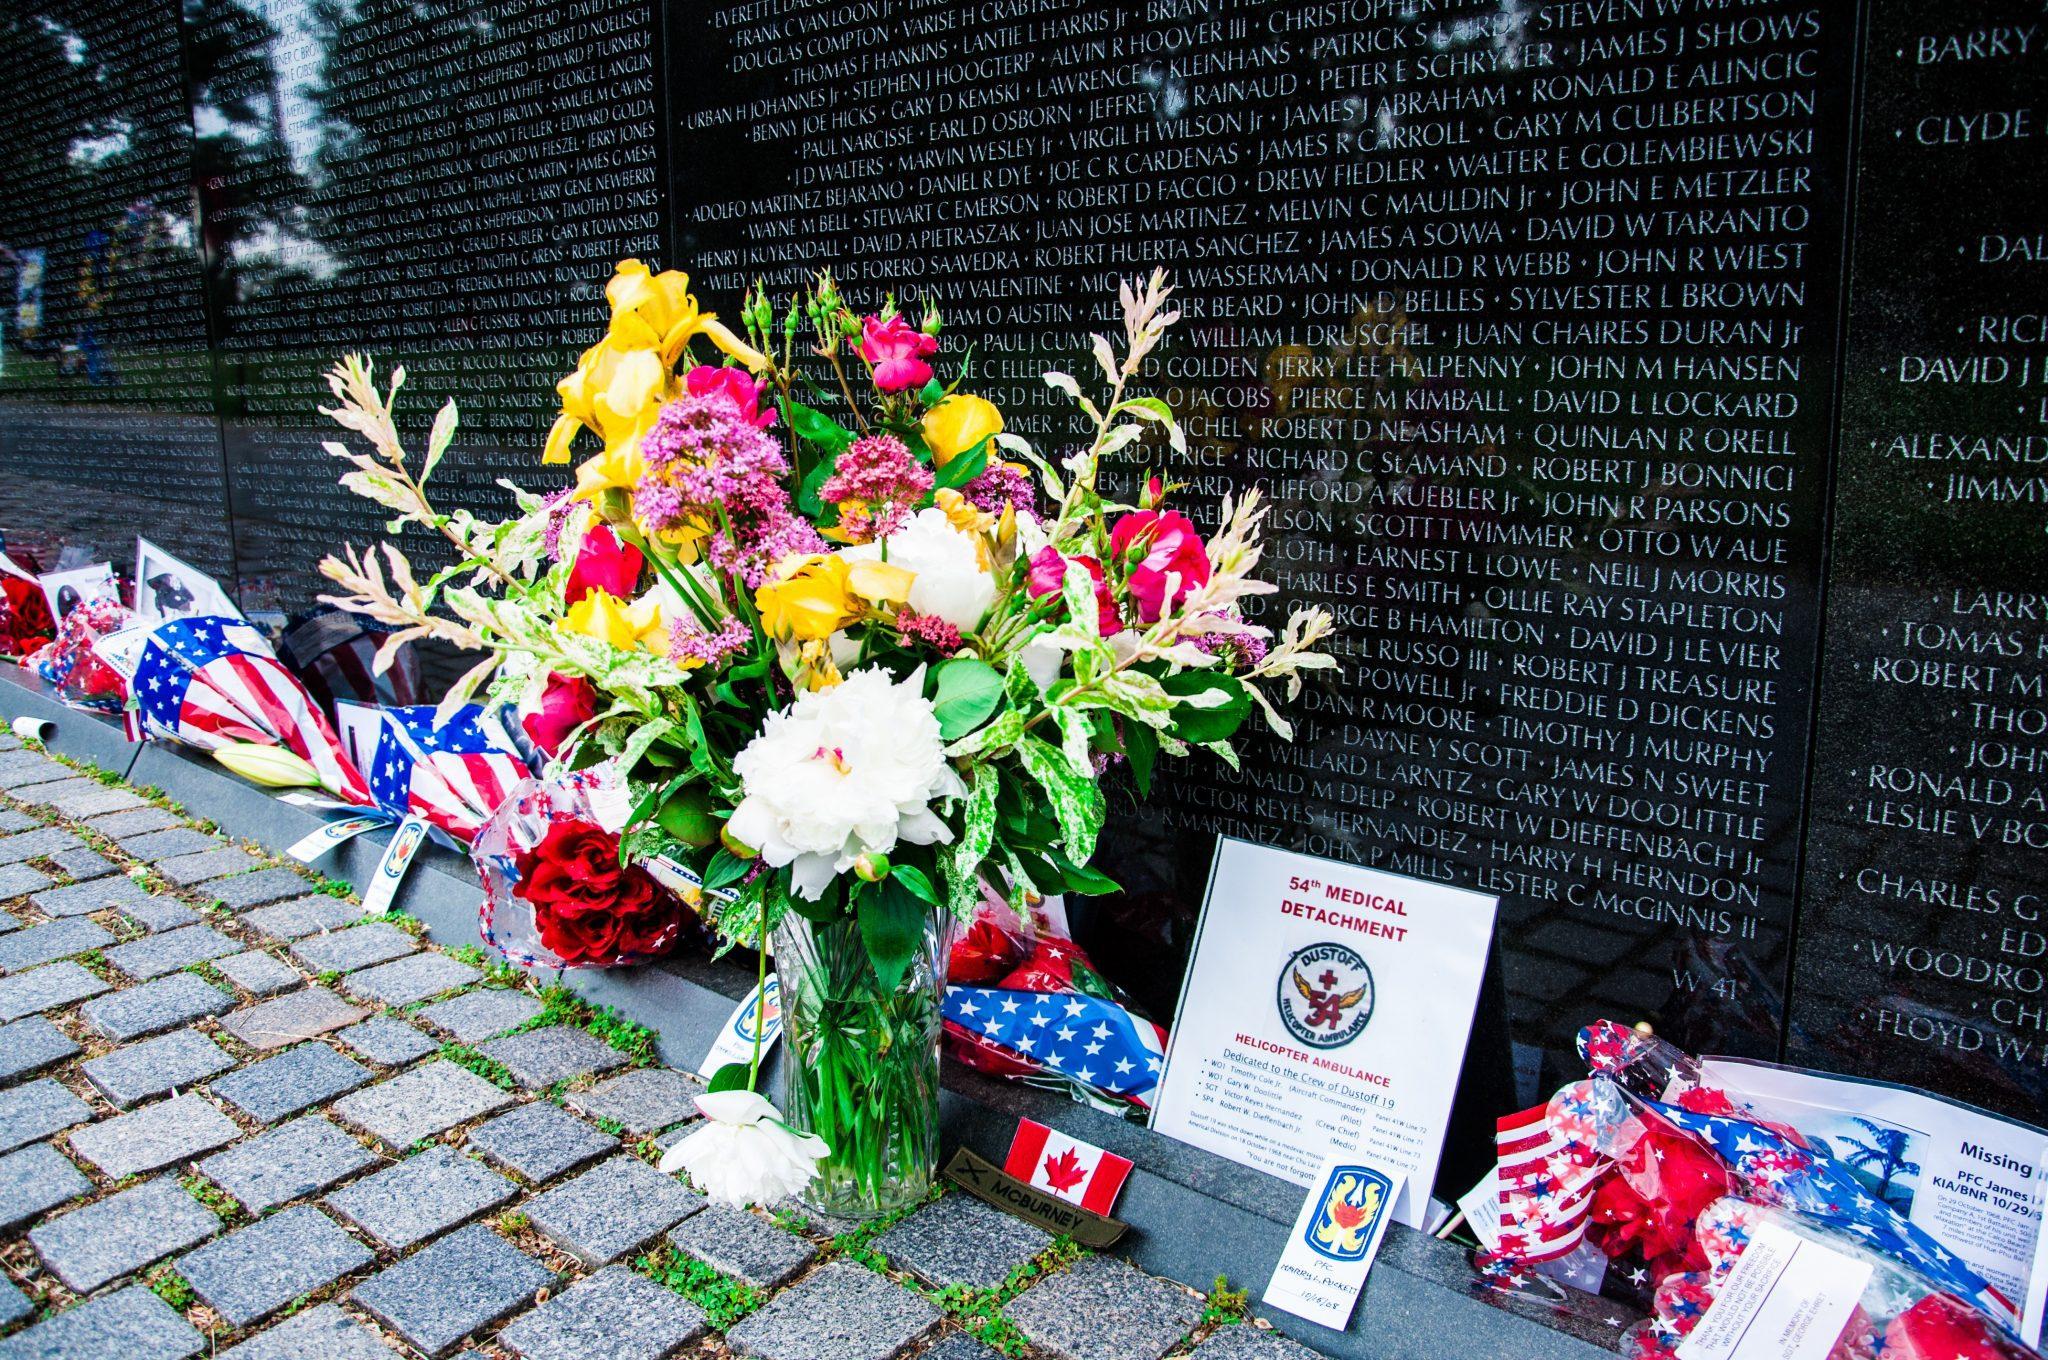 Vietnam Veterans Memorial on Memorial Day, USA